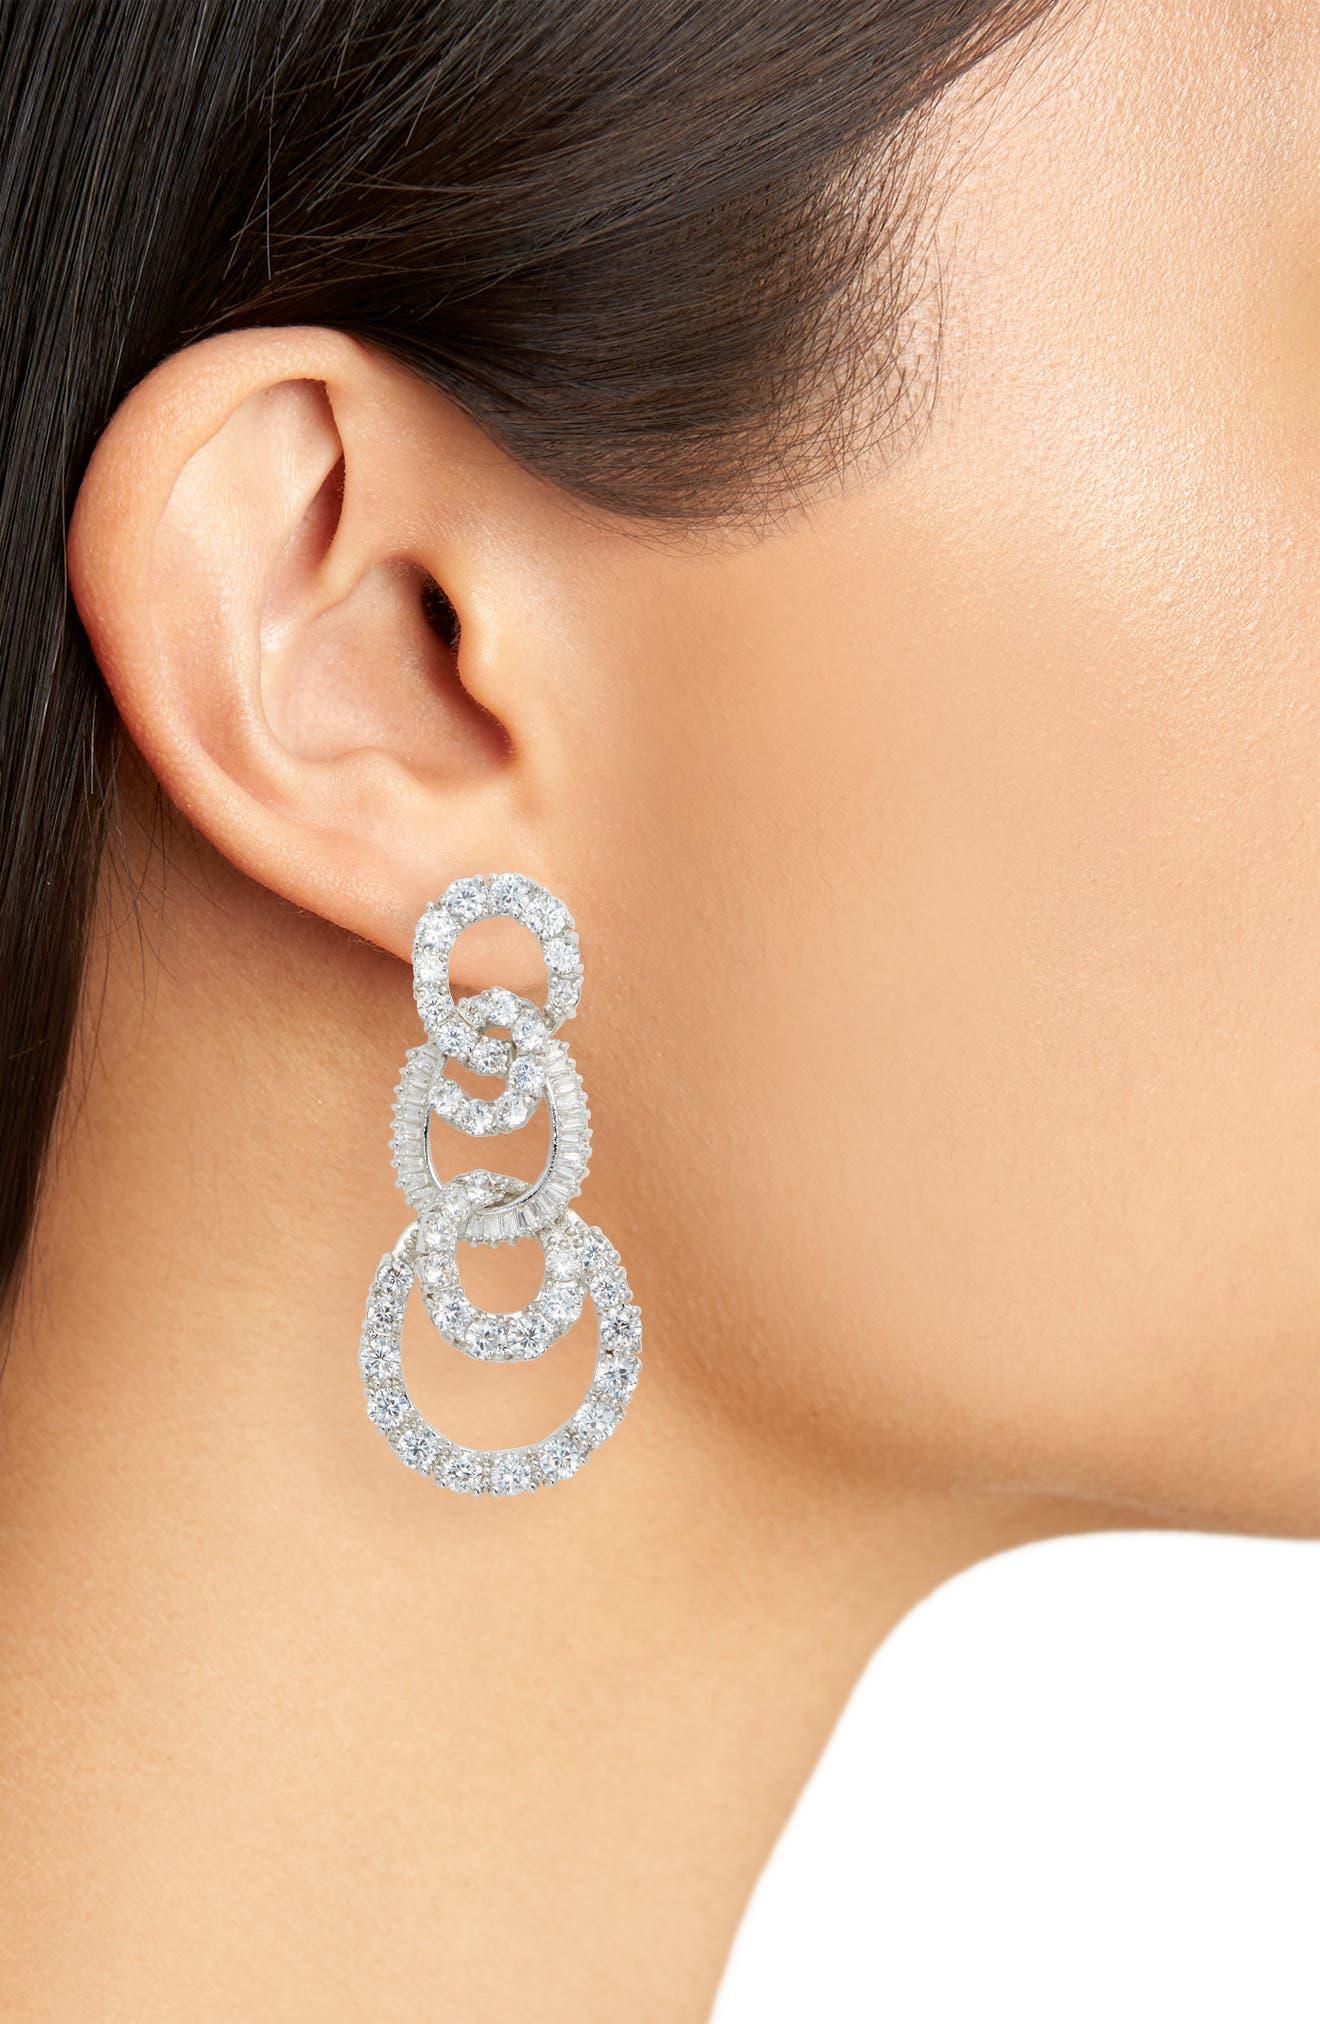 3-Tier Swirl Drop Earrings,                             Alternate thumbnail 2, color,                             WHITE/ SILVER